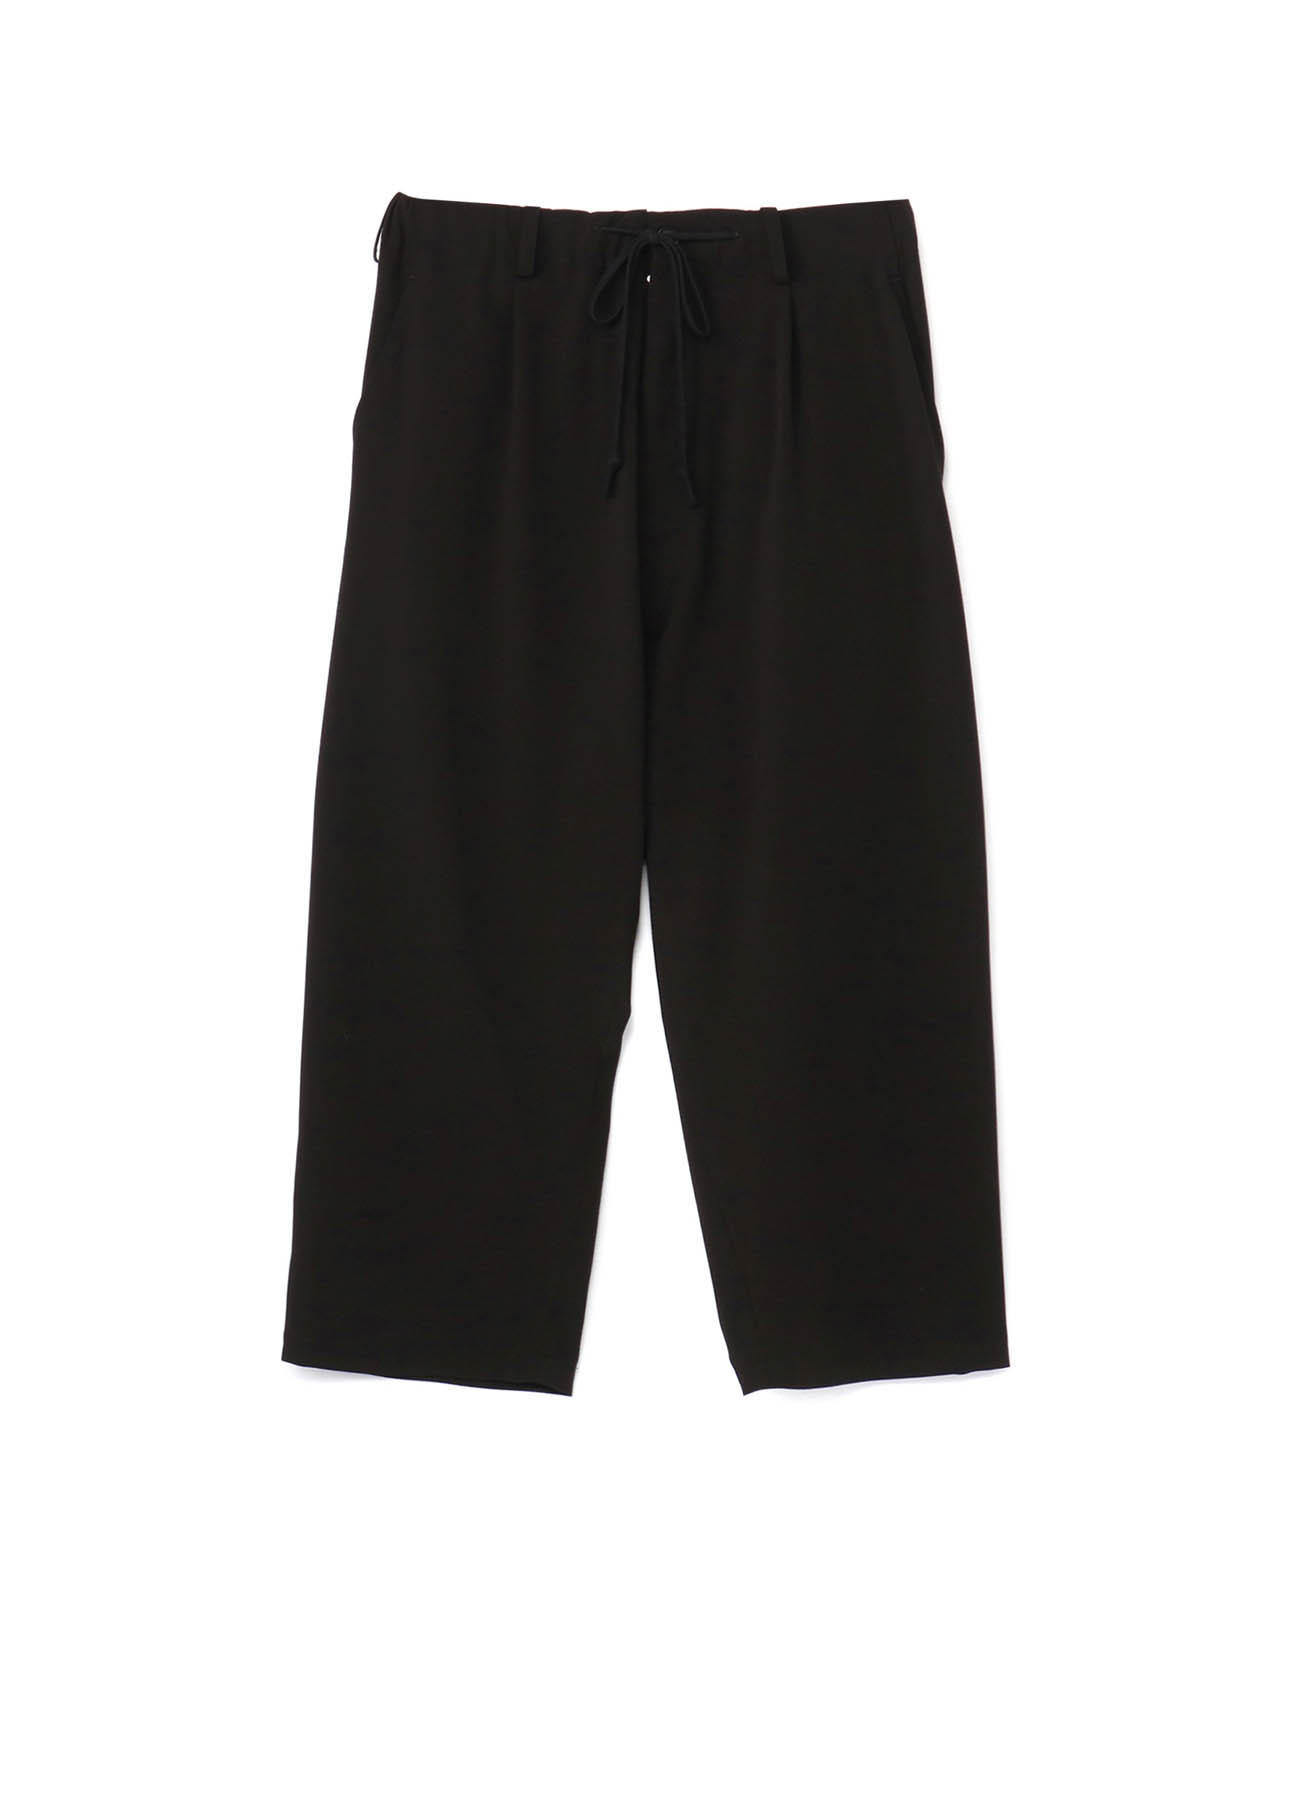 Pe/Rayon Gabardine Stretch One Tuck Waist Code 3 Adjuster Pants